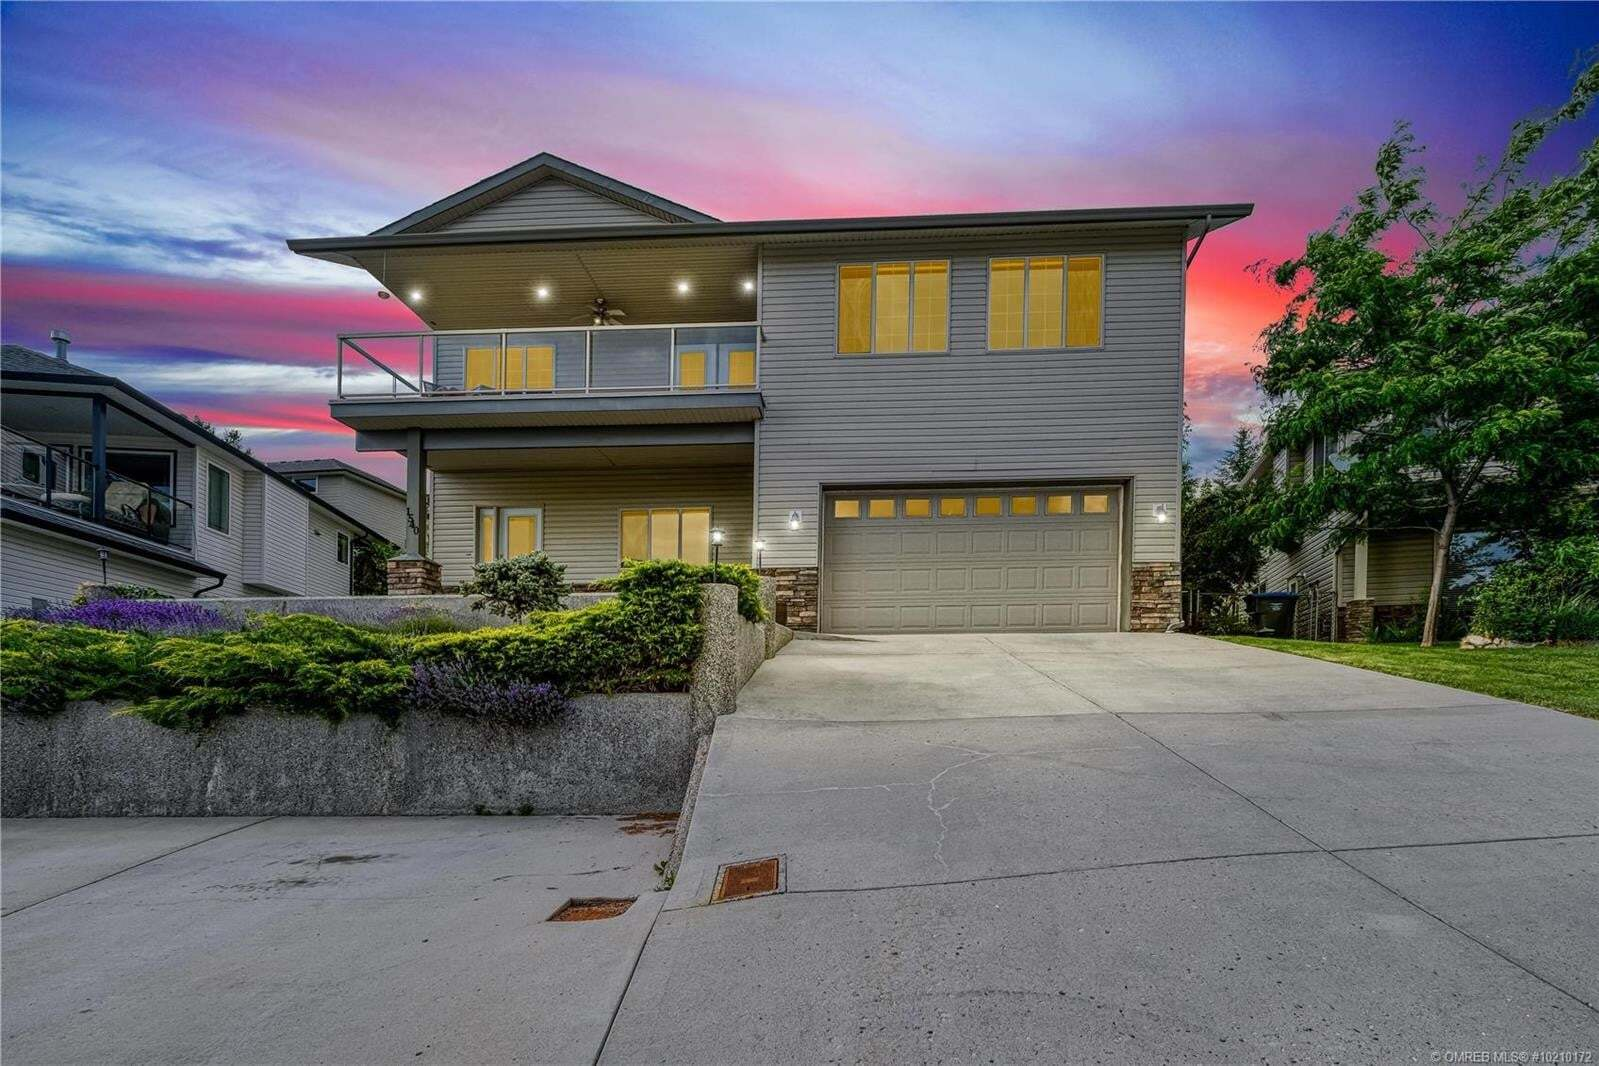 House for sale at 1540 Longley Cres Kelowna British Columbia - MLS: 10210172